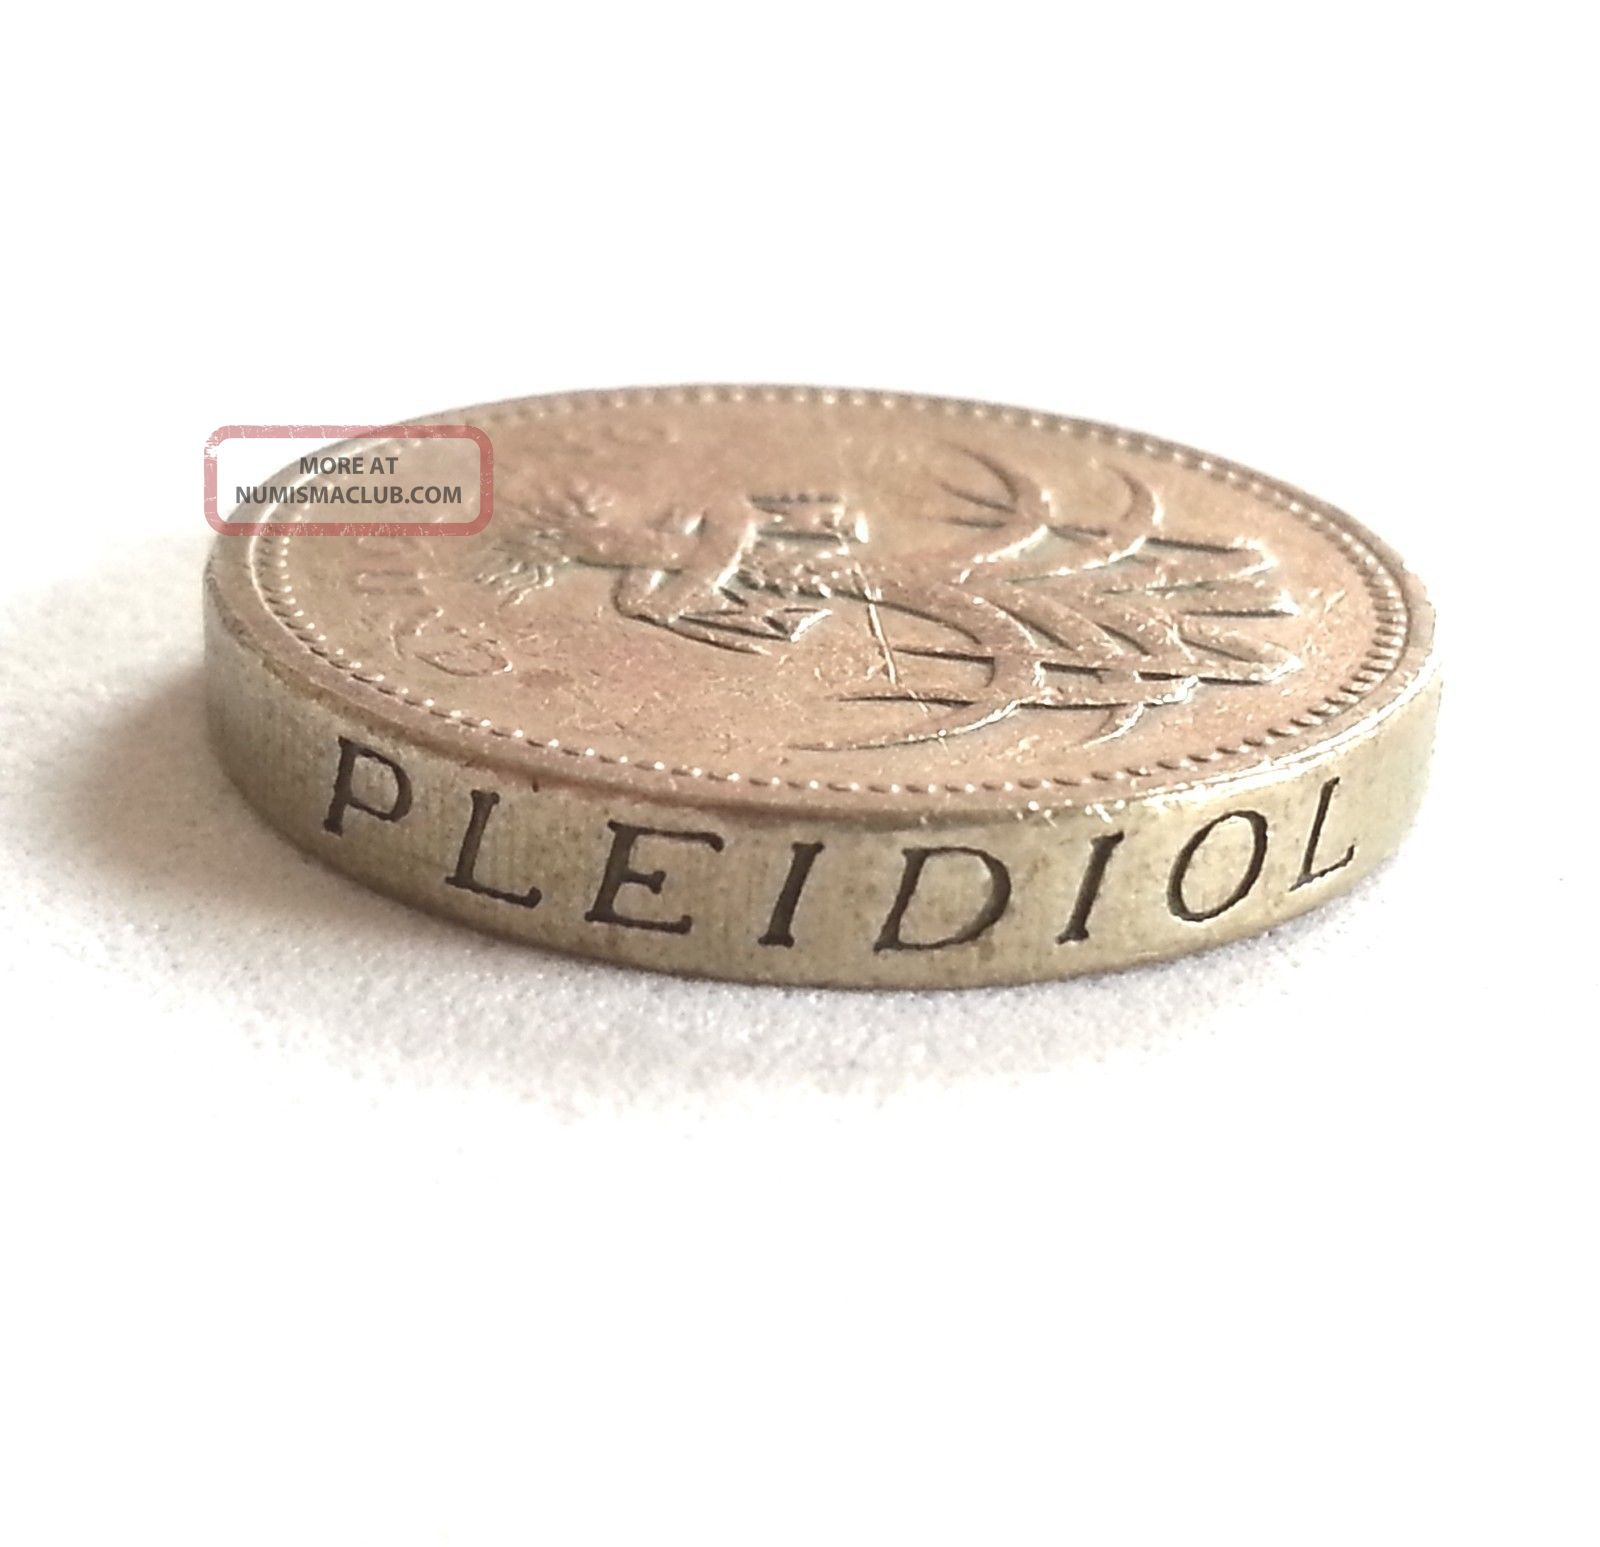 1985 One Pound 1 Silver Coin Elizabeth 2 I ' M Gwlad Uk Gbp Great Britain Europe UK (Great Britain) photo